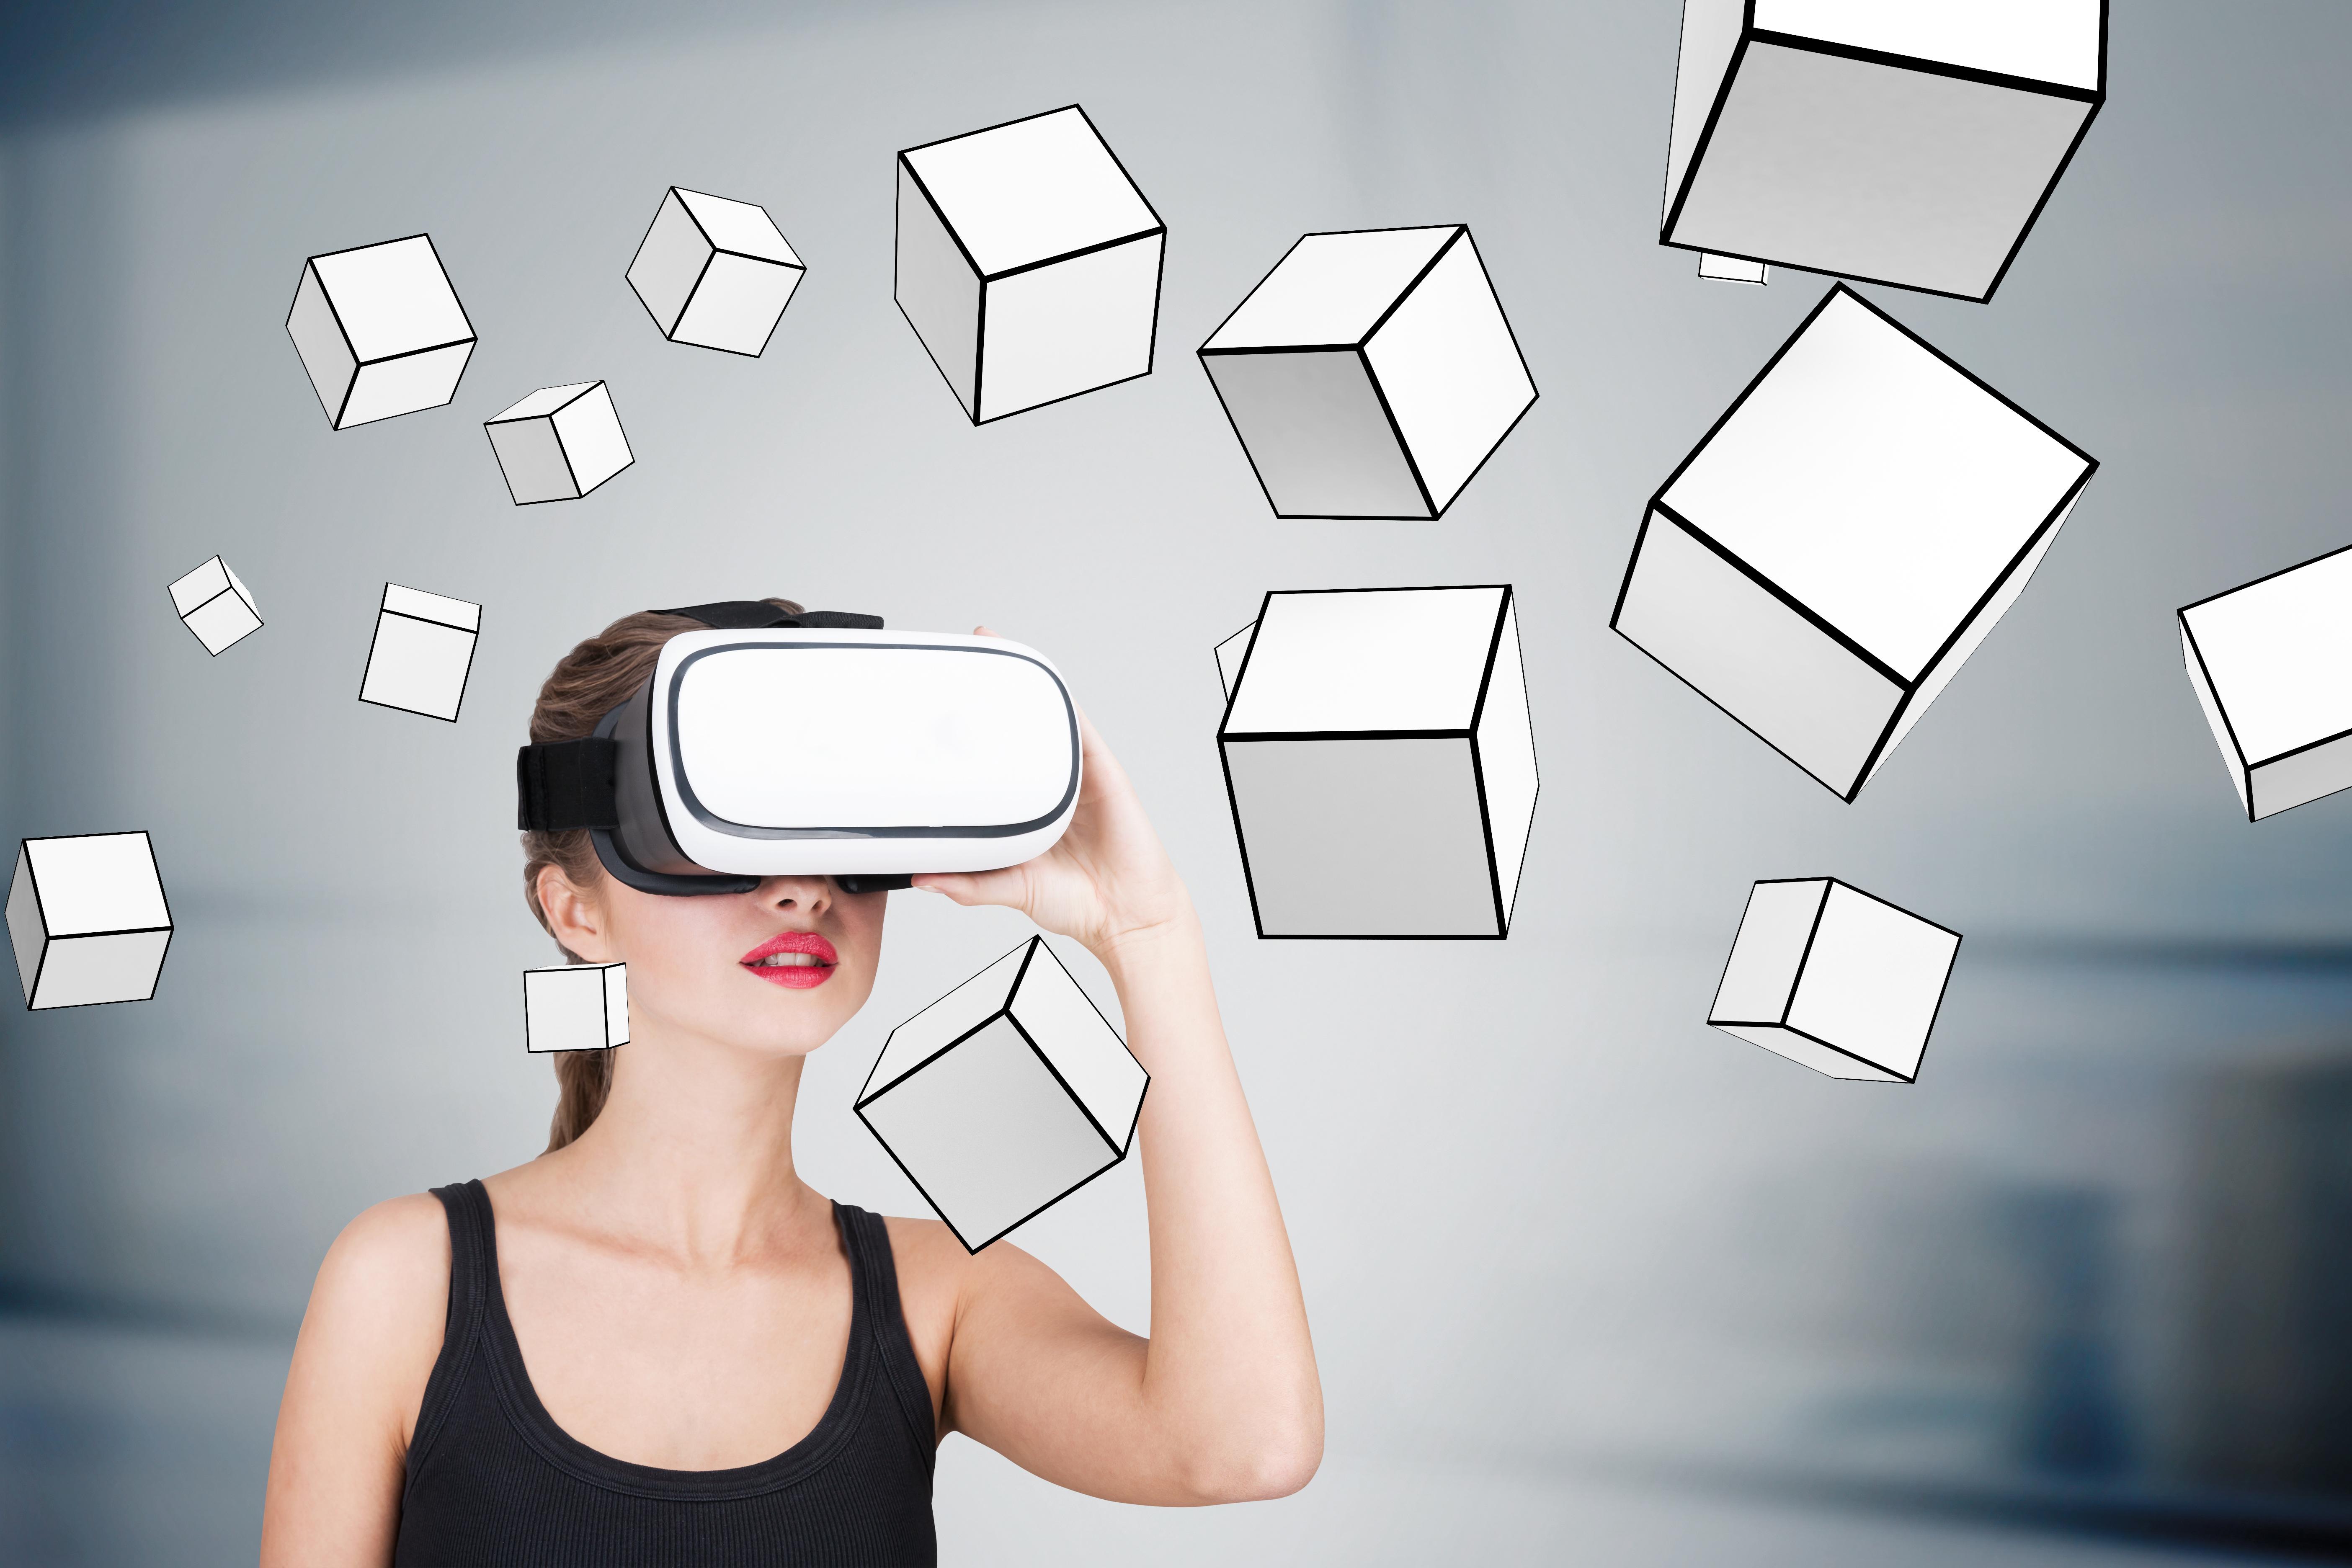 VR空間でアートができる!?「美人YouTuber」せきぐちあいみさんの世界